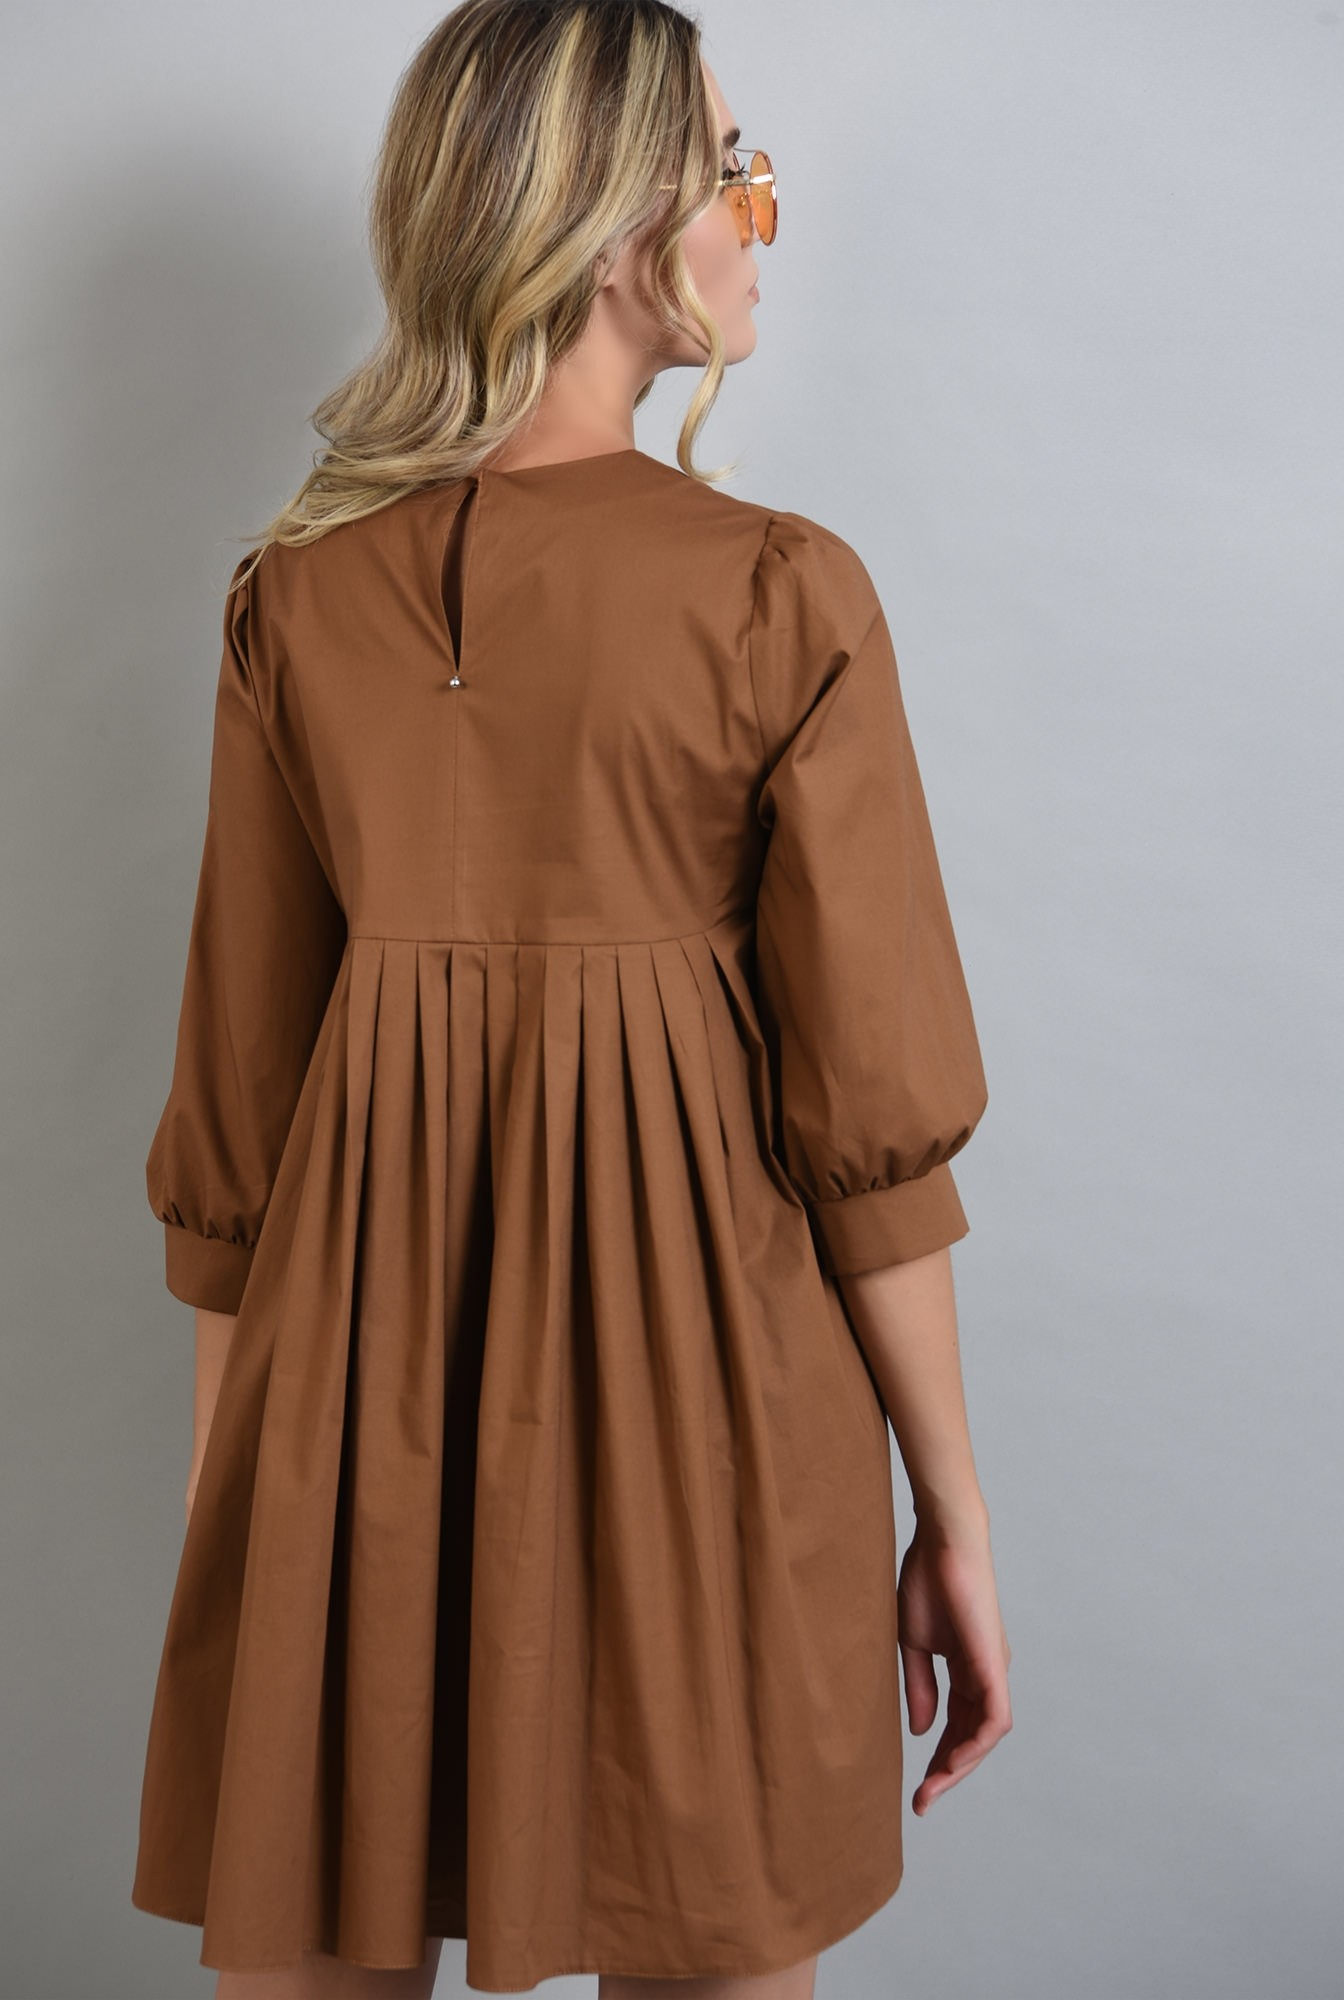 1 - rochie maro, din bumbac, cu pliuri, Poema